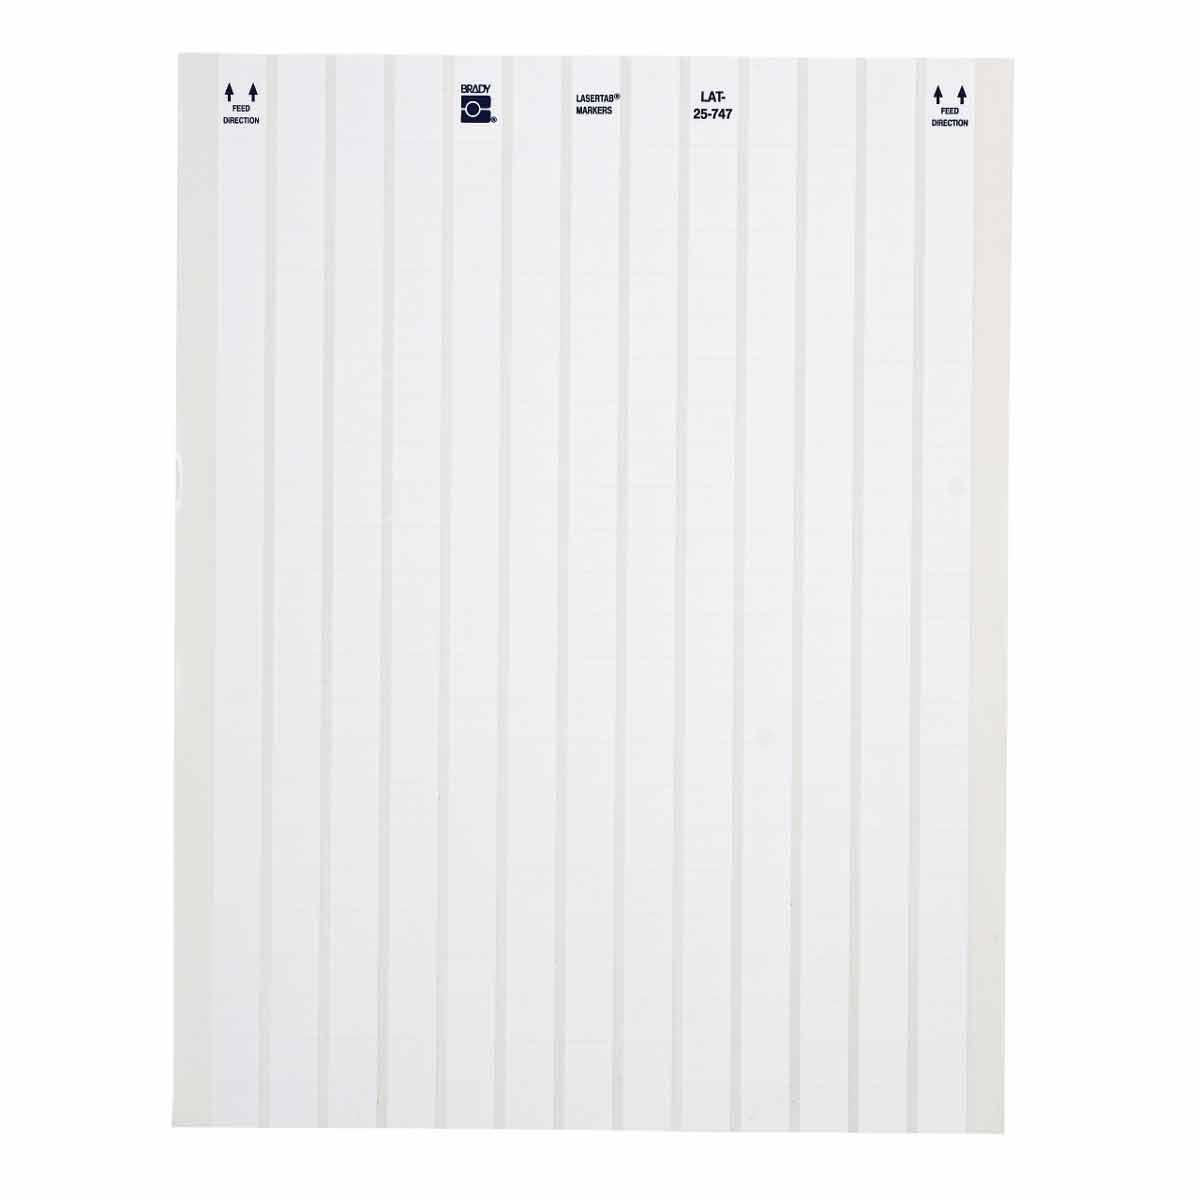 LaserTab Series Polyester Labels